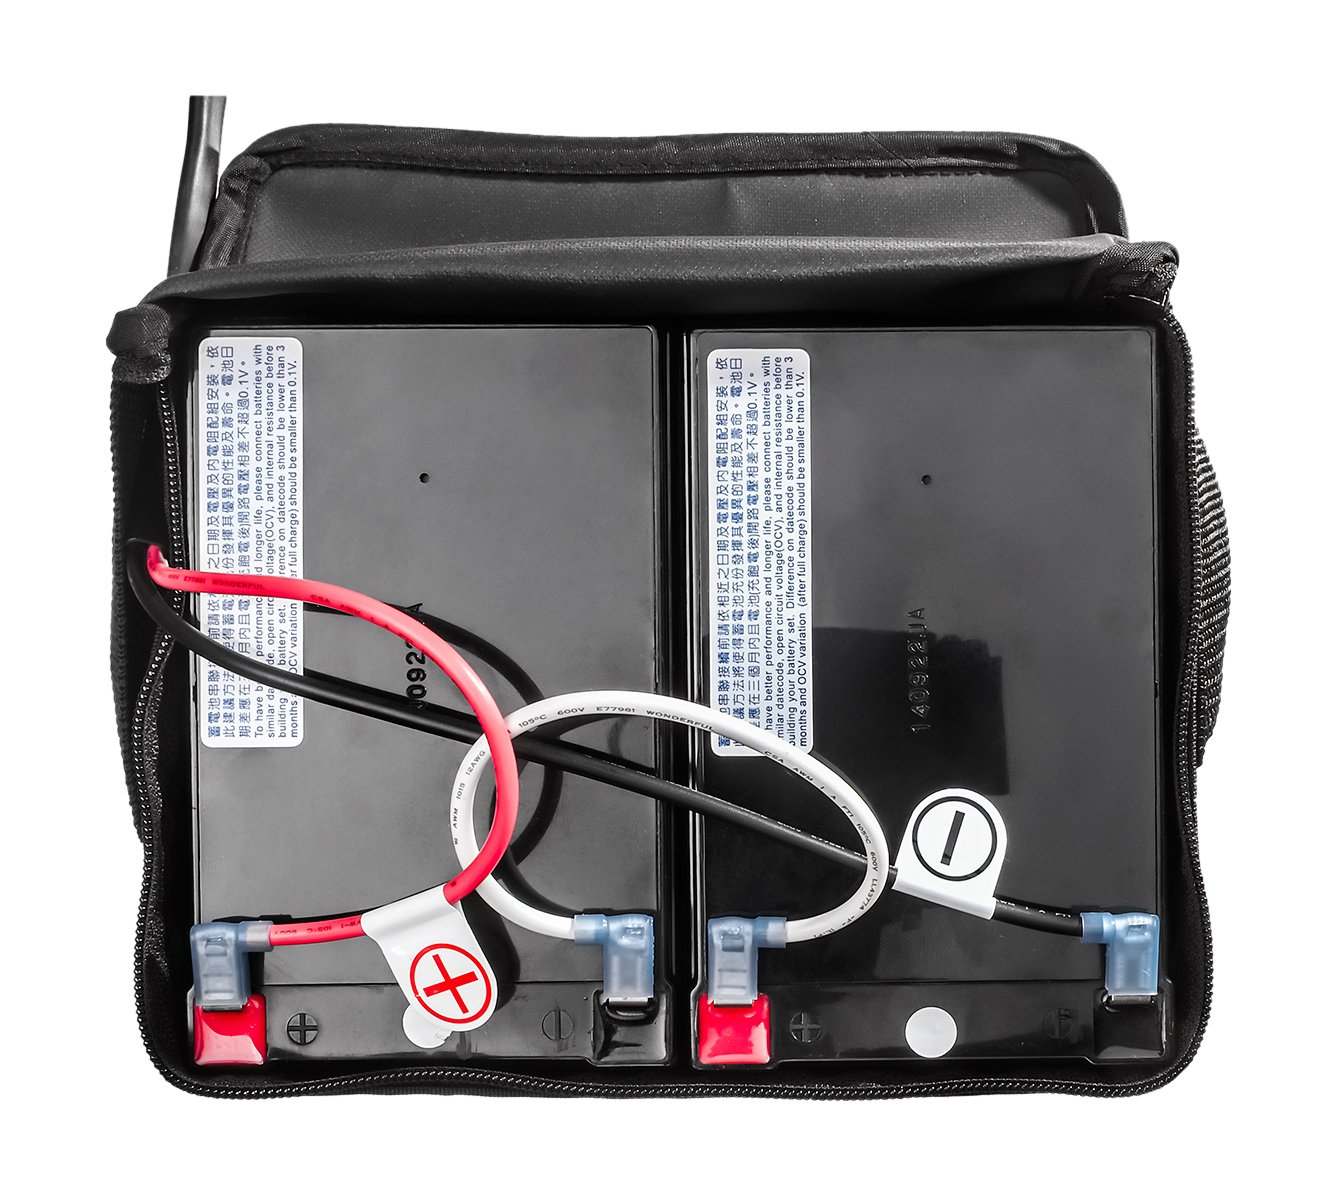 FreeRider USA PK90-0202-KL Luggie Classic Lead Acid Battery